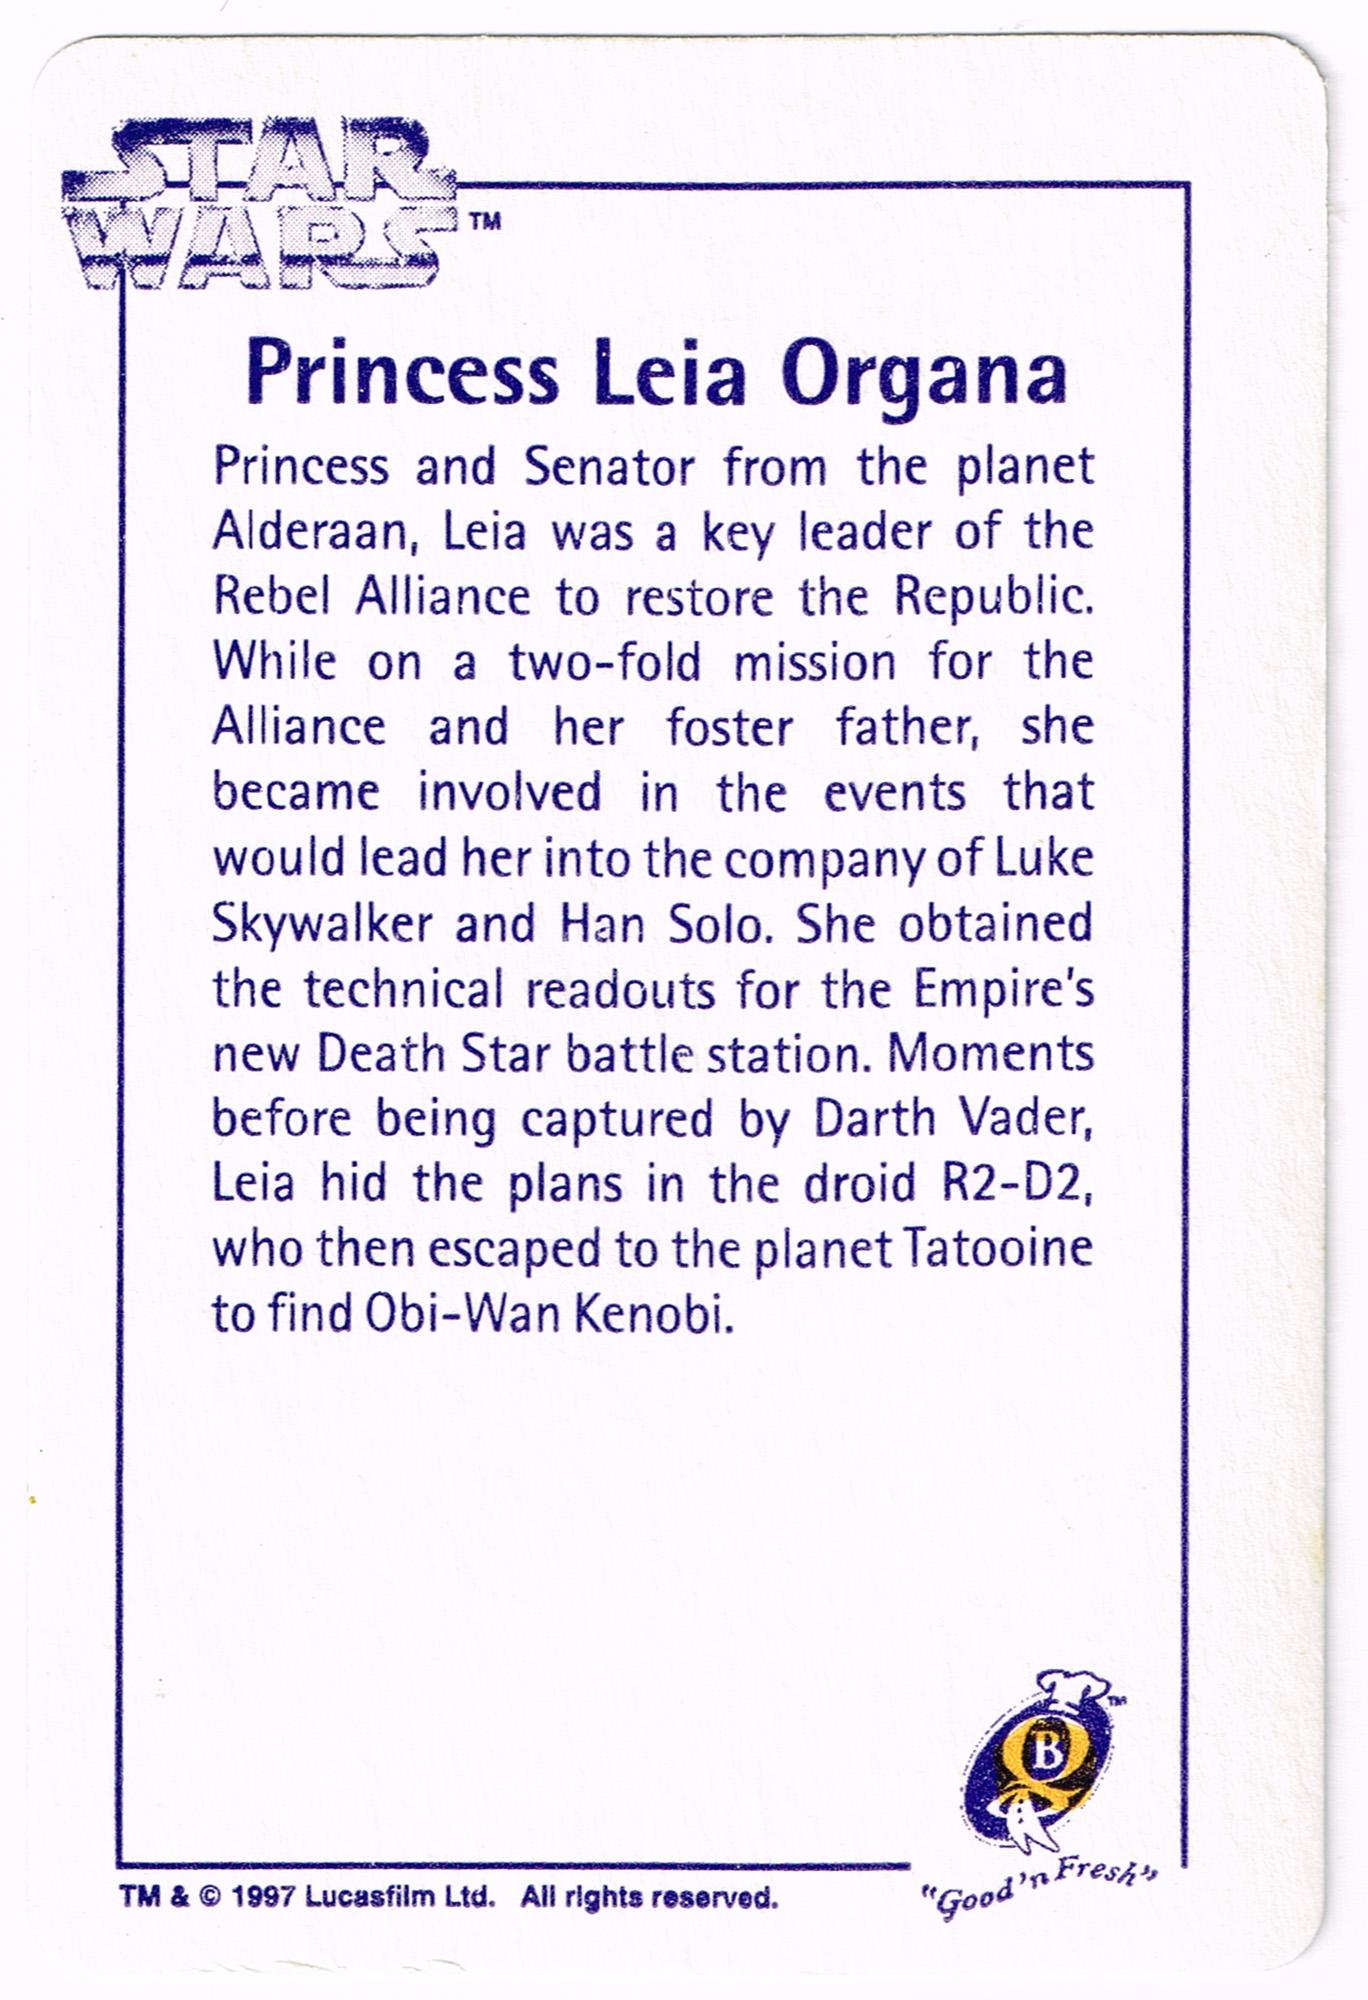 Quality Bakers Card 3 - Princess Leia Organa